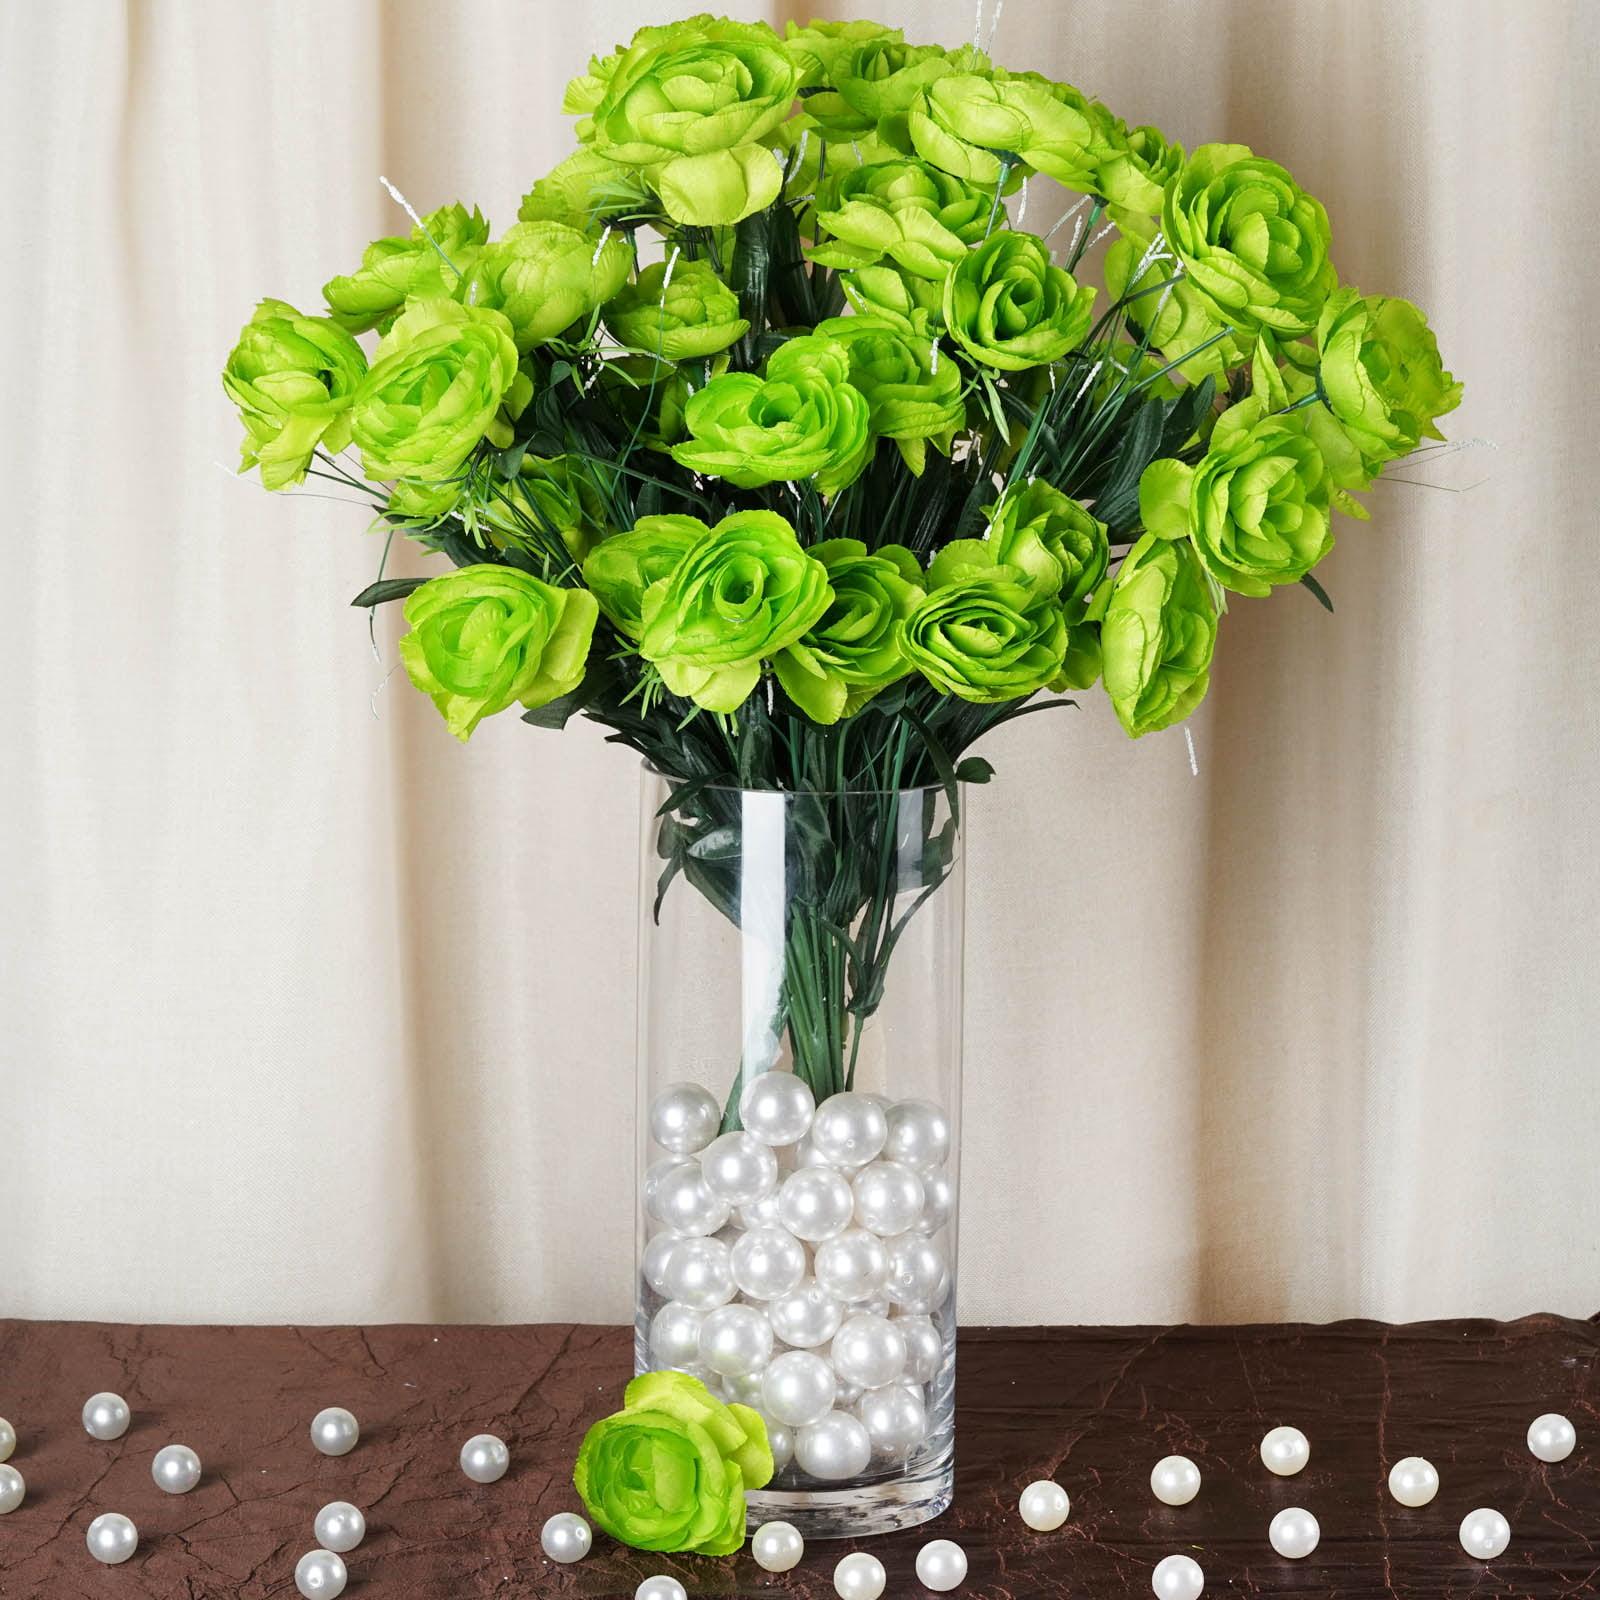 BalsaCircle 72 Silk Ranunculus Artificial Silk Flowers - DIY Home Wedding Party Bouquets Arrangements Centerpieces